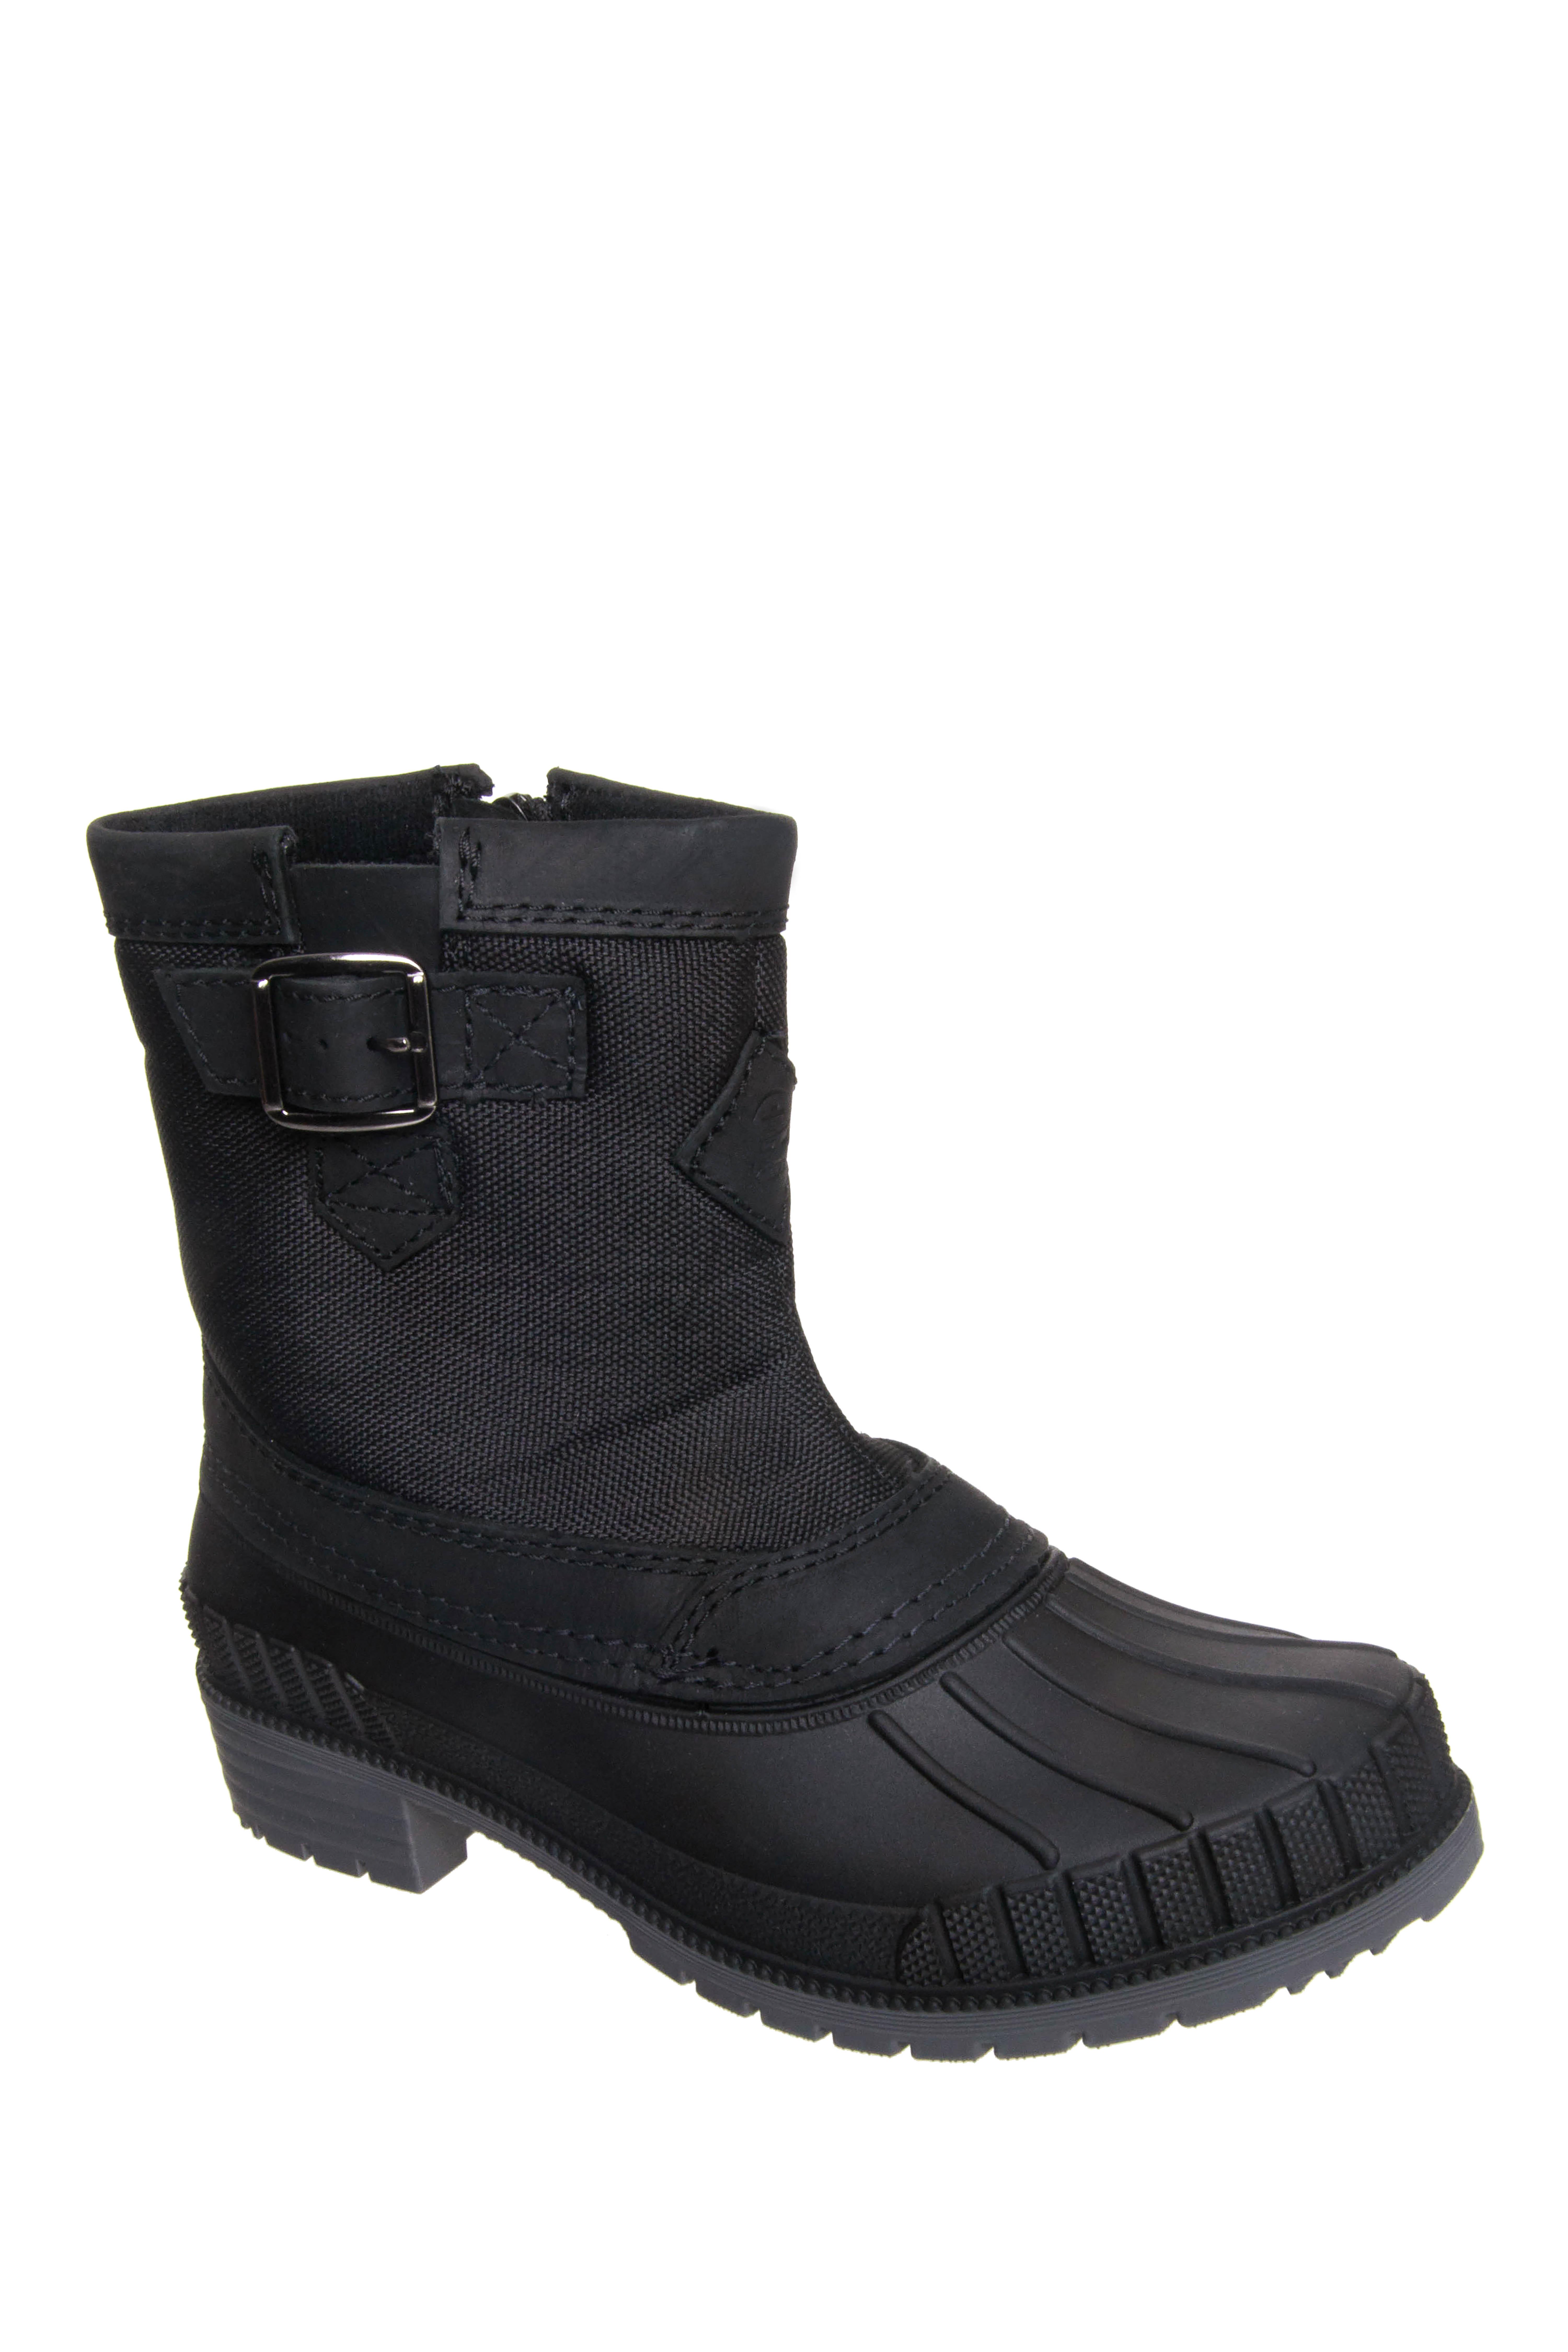 Kamik Avelle Low Heel Snow Boots - Black